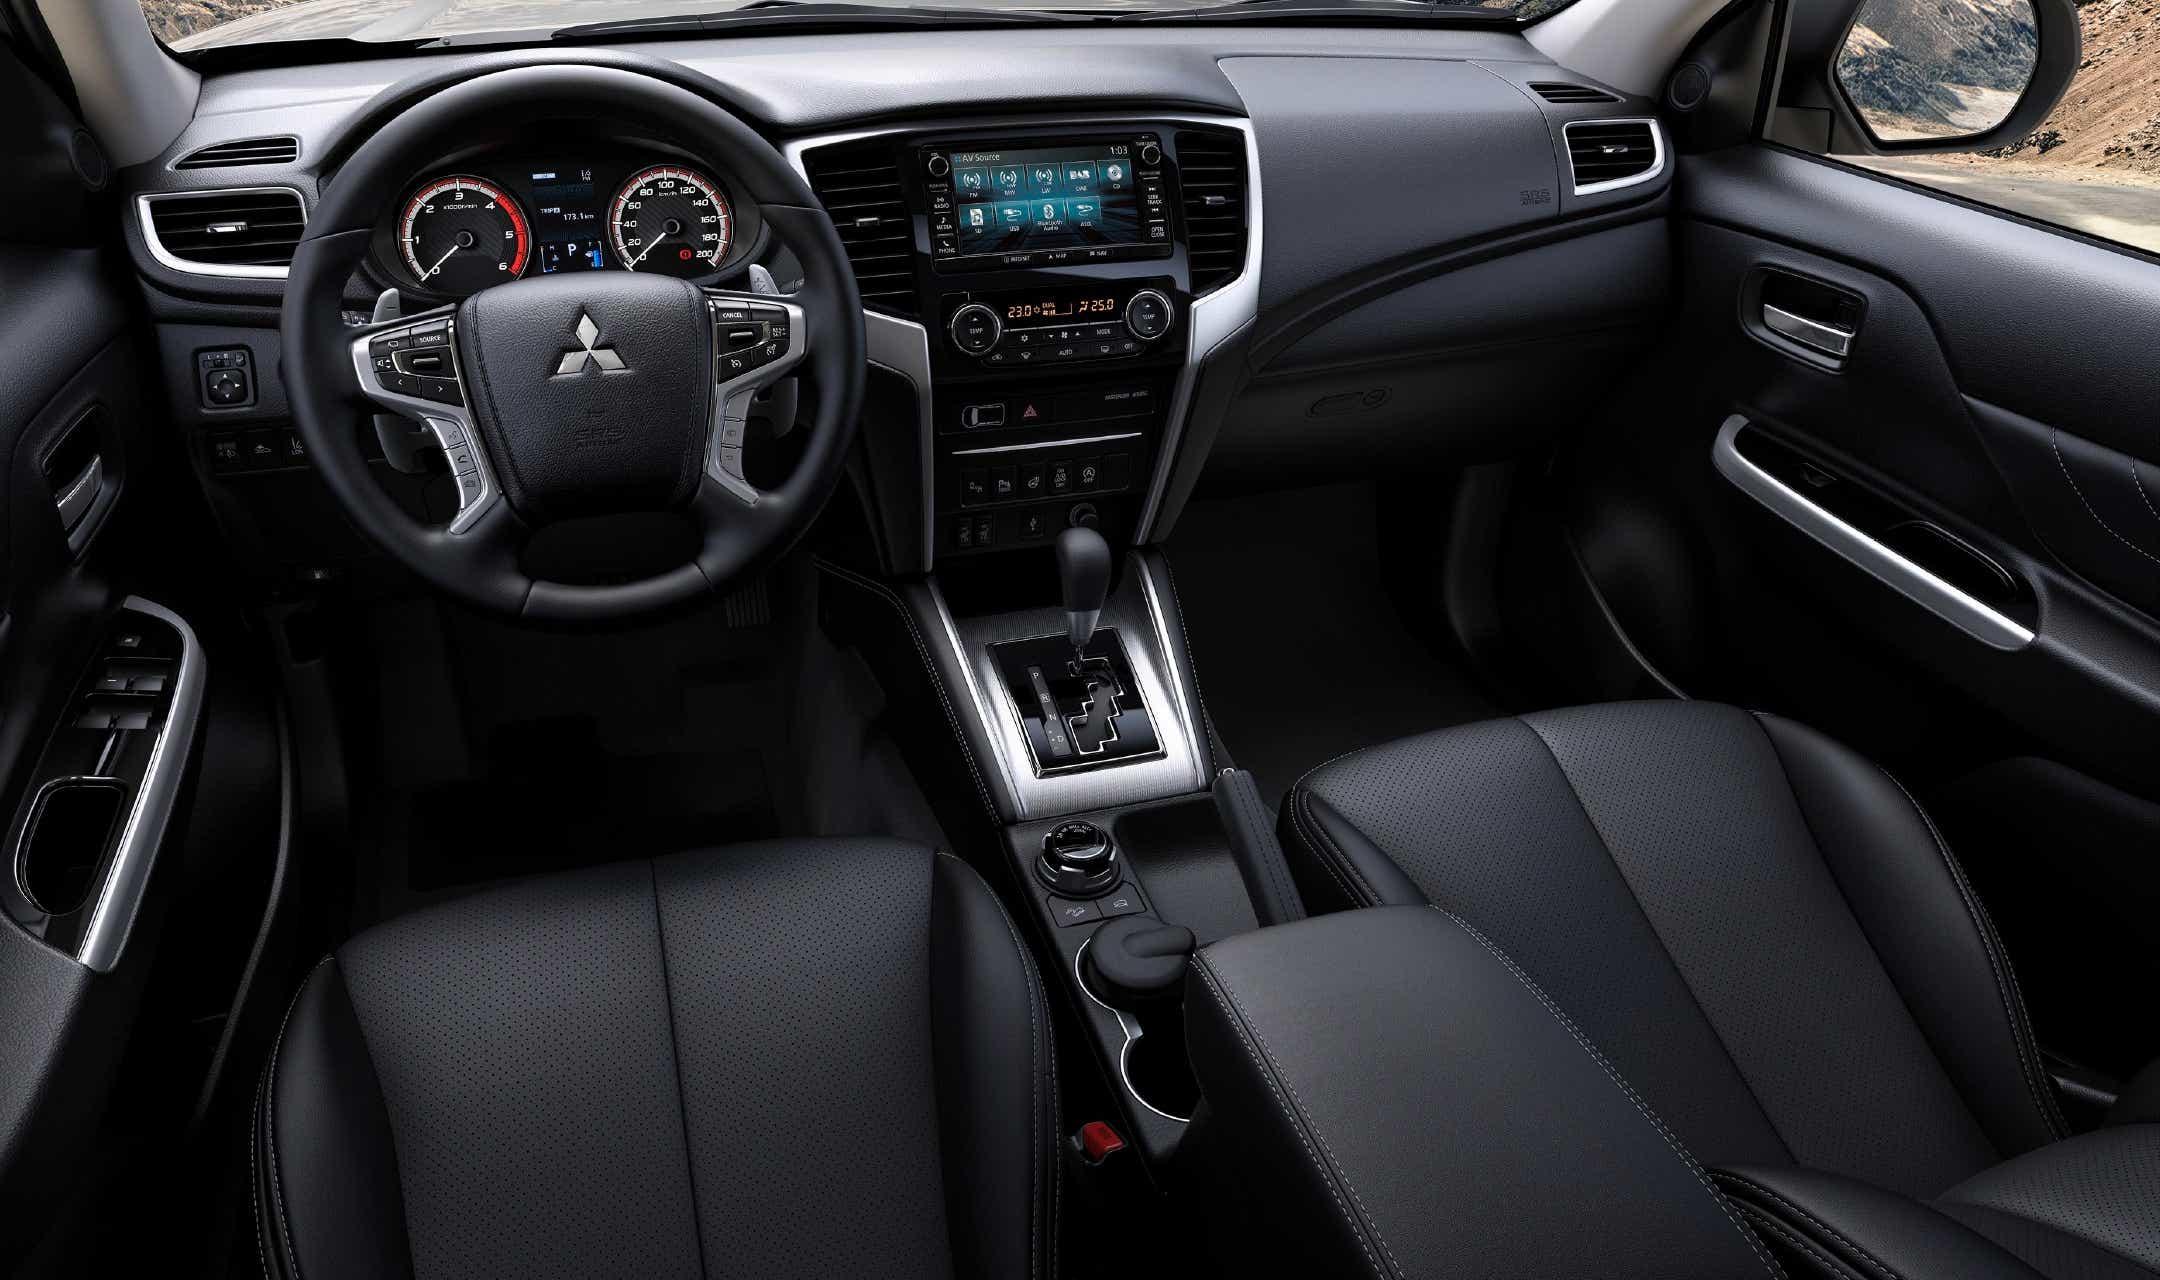 2020 Mitsubishi L200 Images